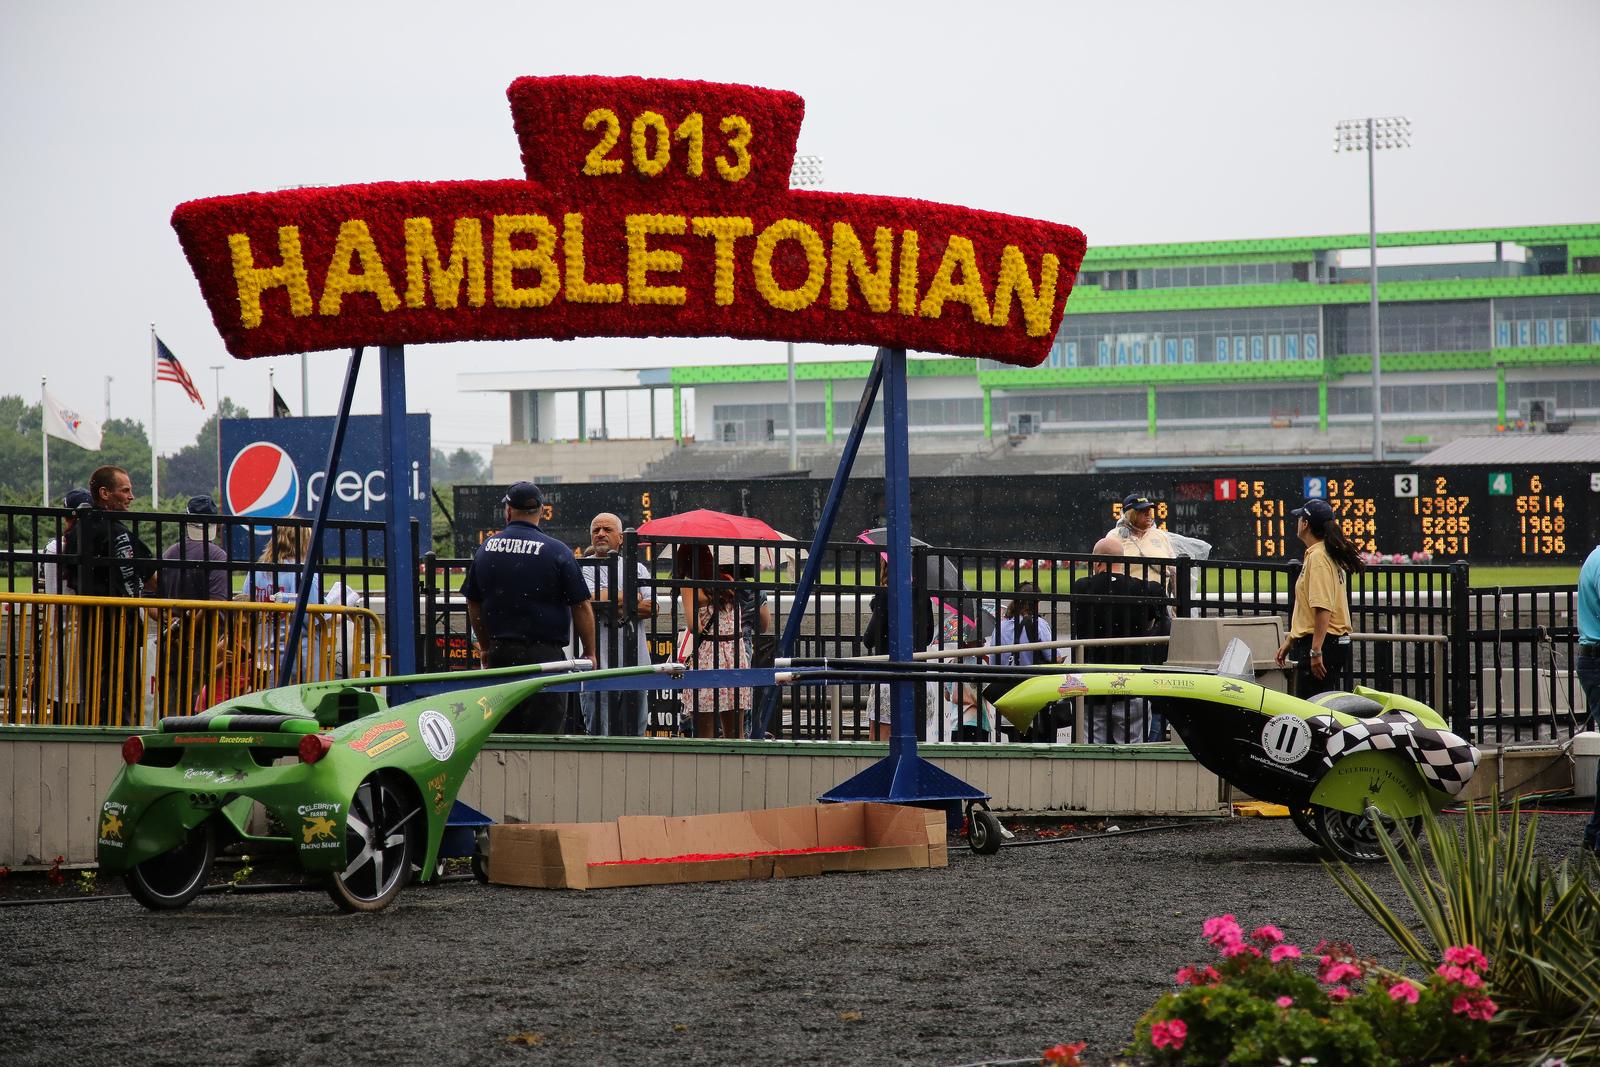 2013 Hambletonian